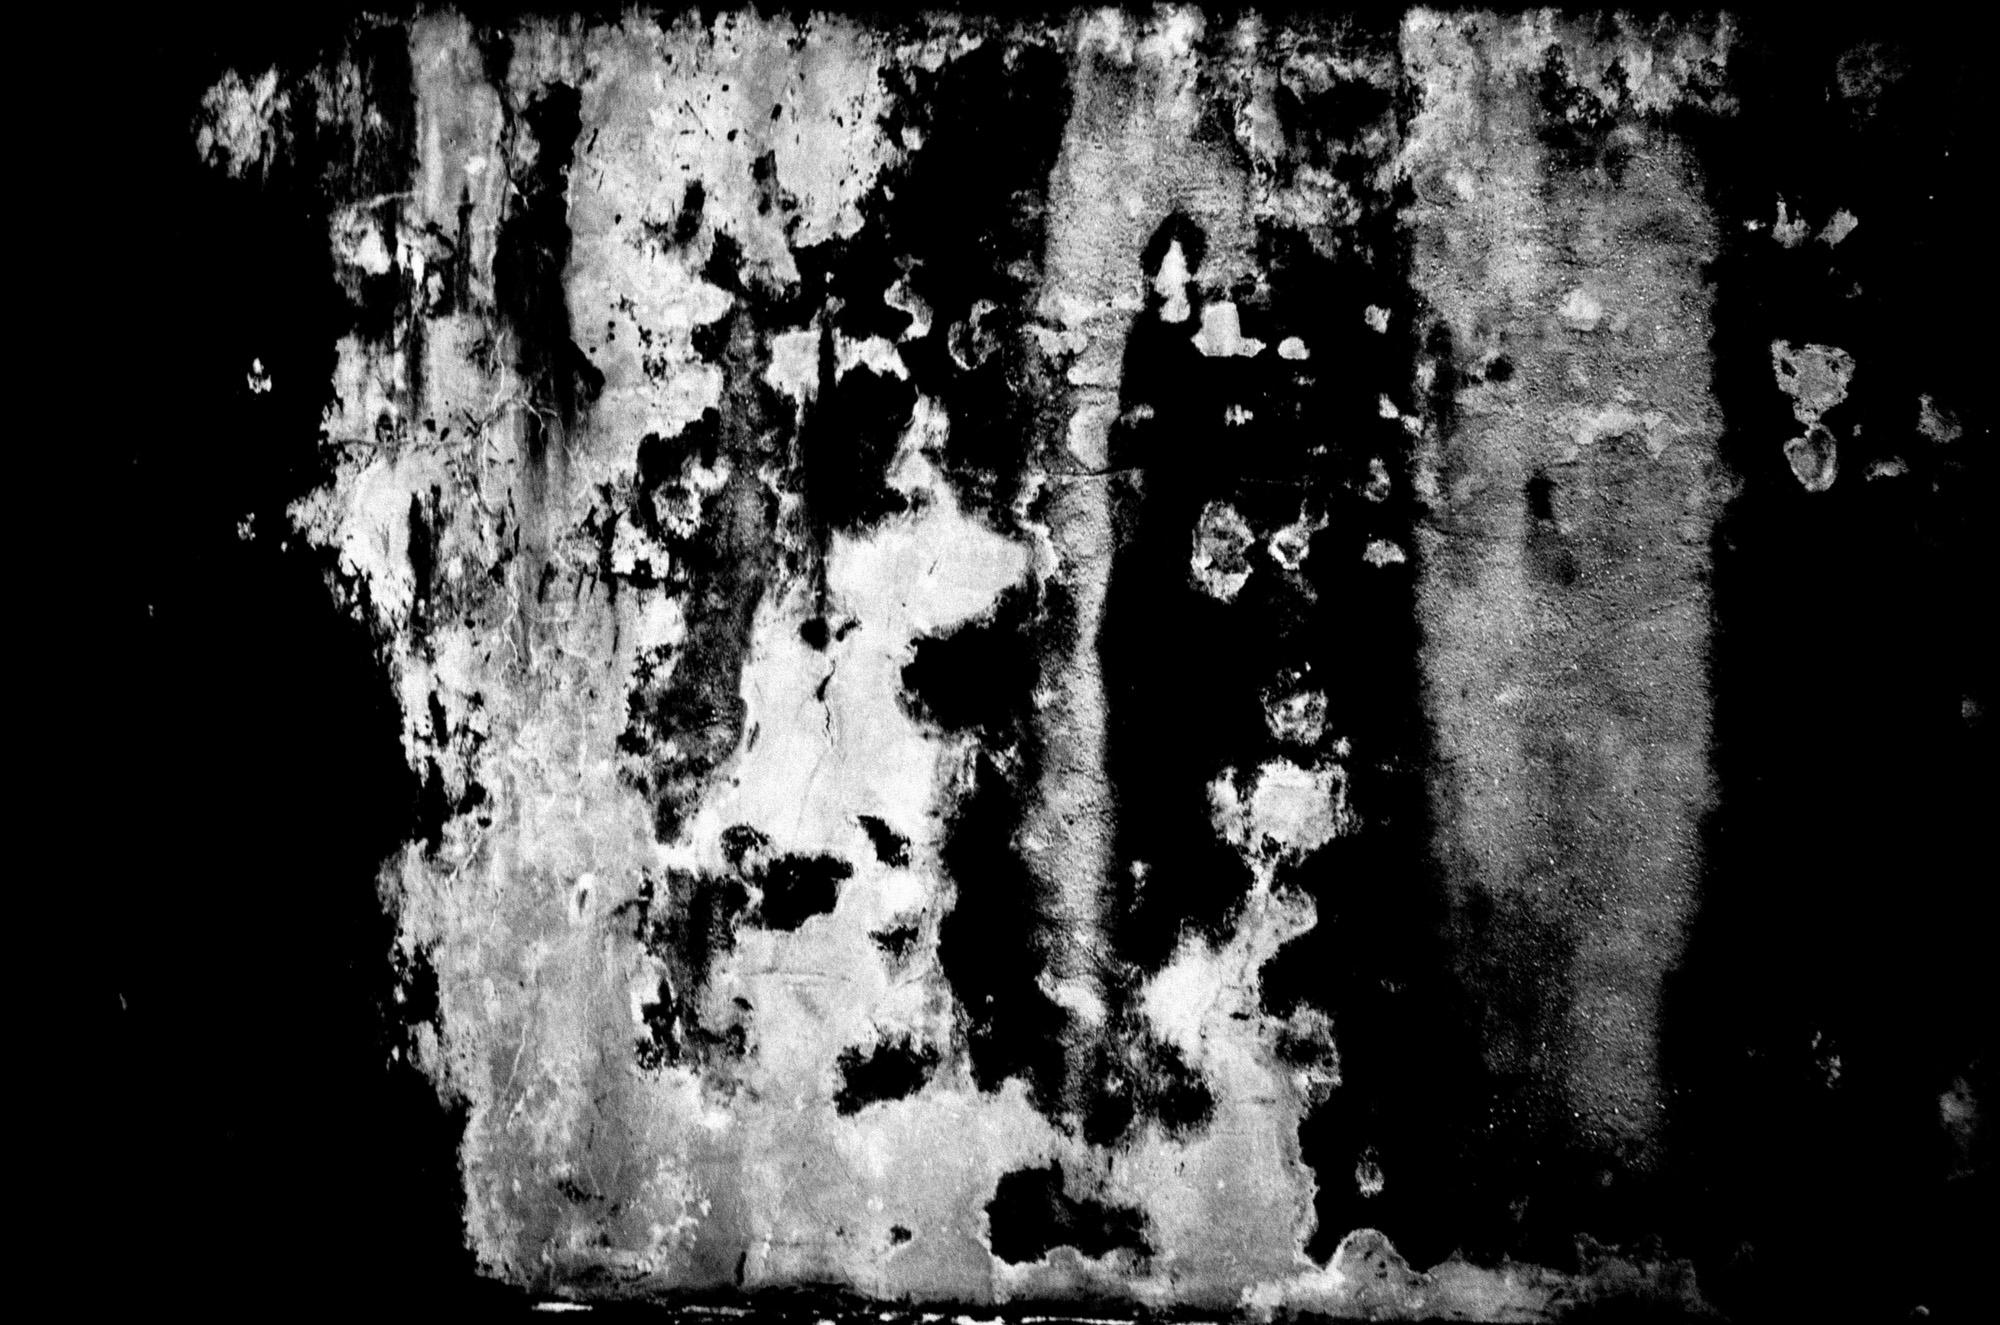 eric kim photography black and white - eric kim photography -2017 - hue-0004756